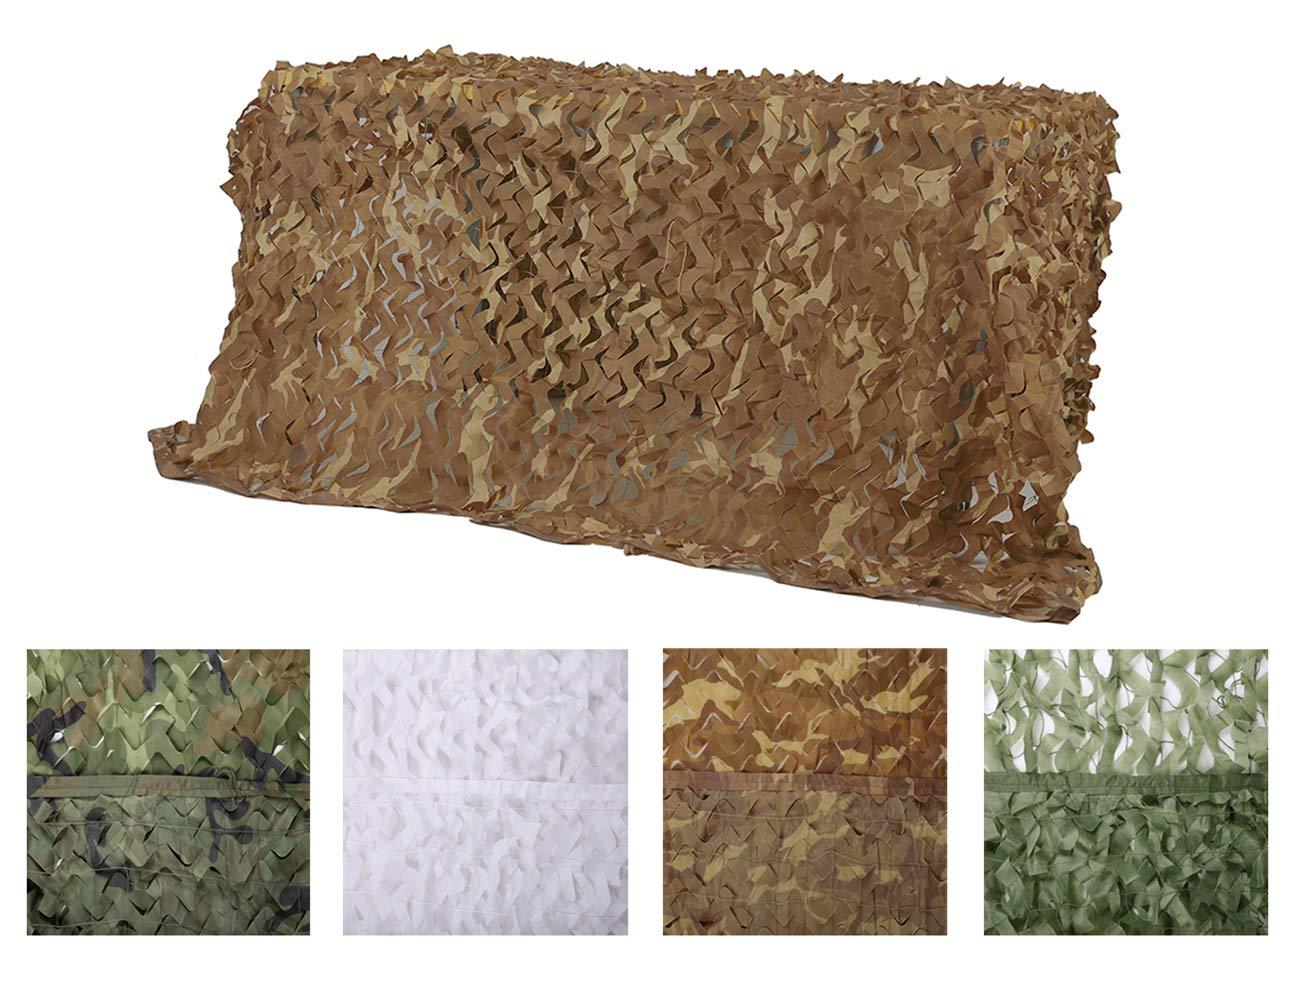 Chiglia Camouflage Netting Camo Net Sunscreen Nets Desert 6.5ftx10ft